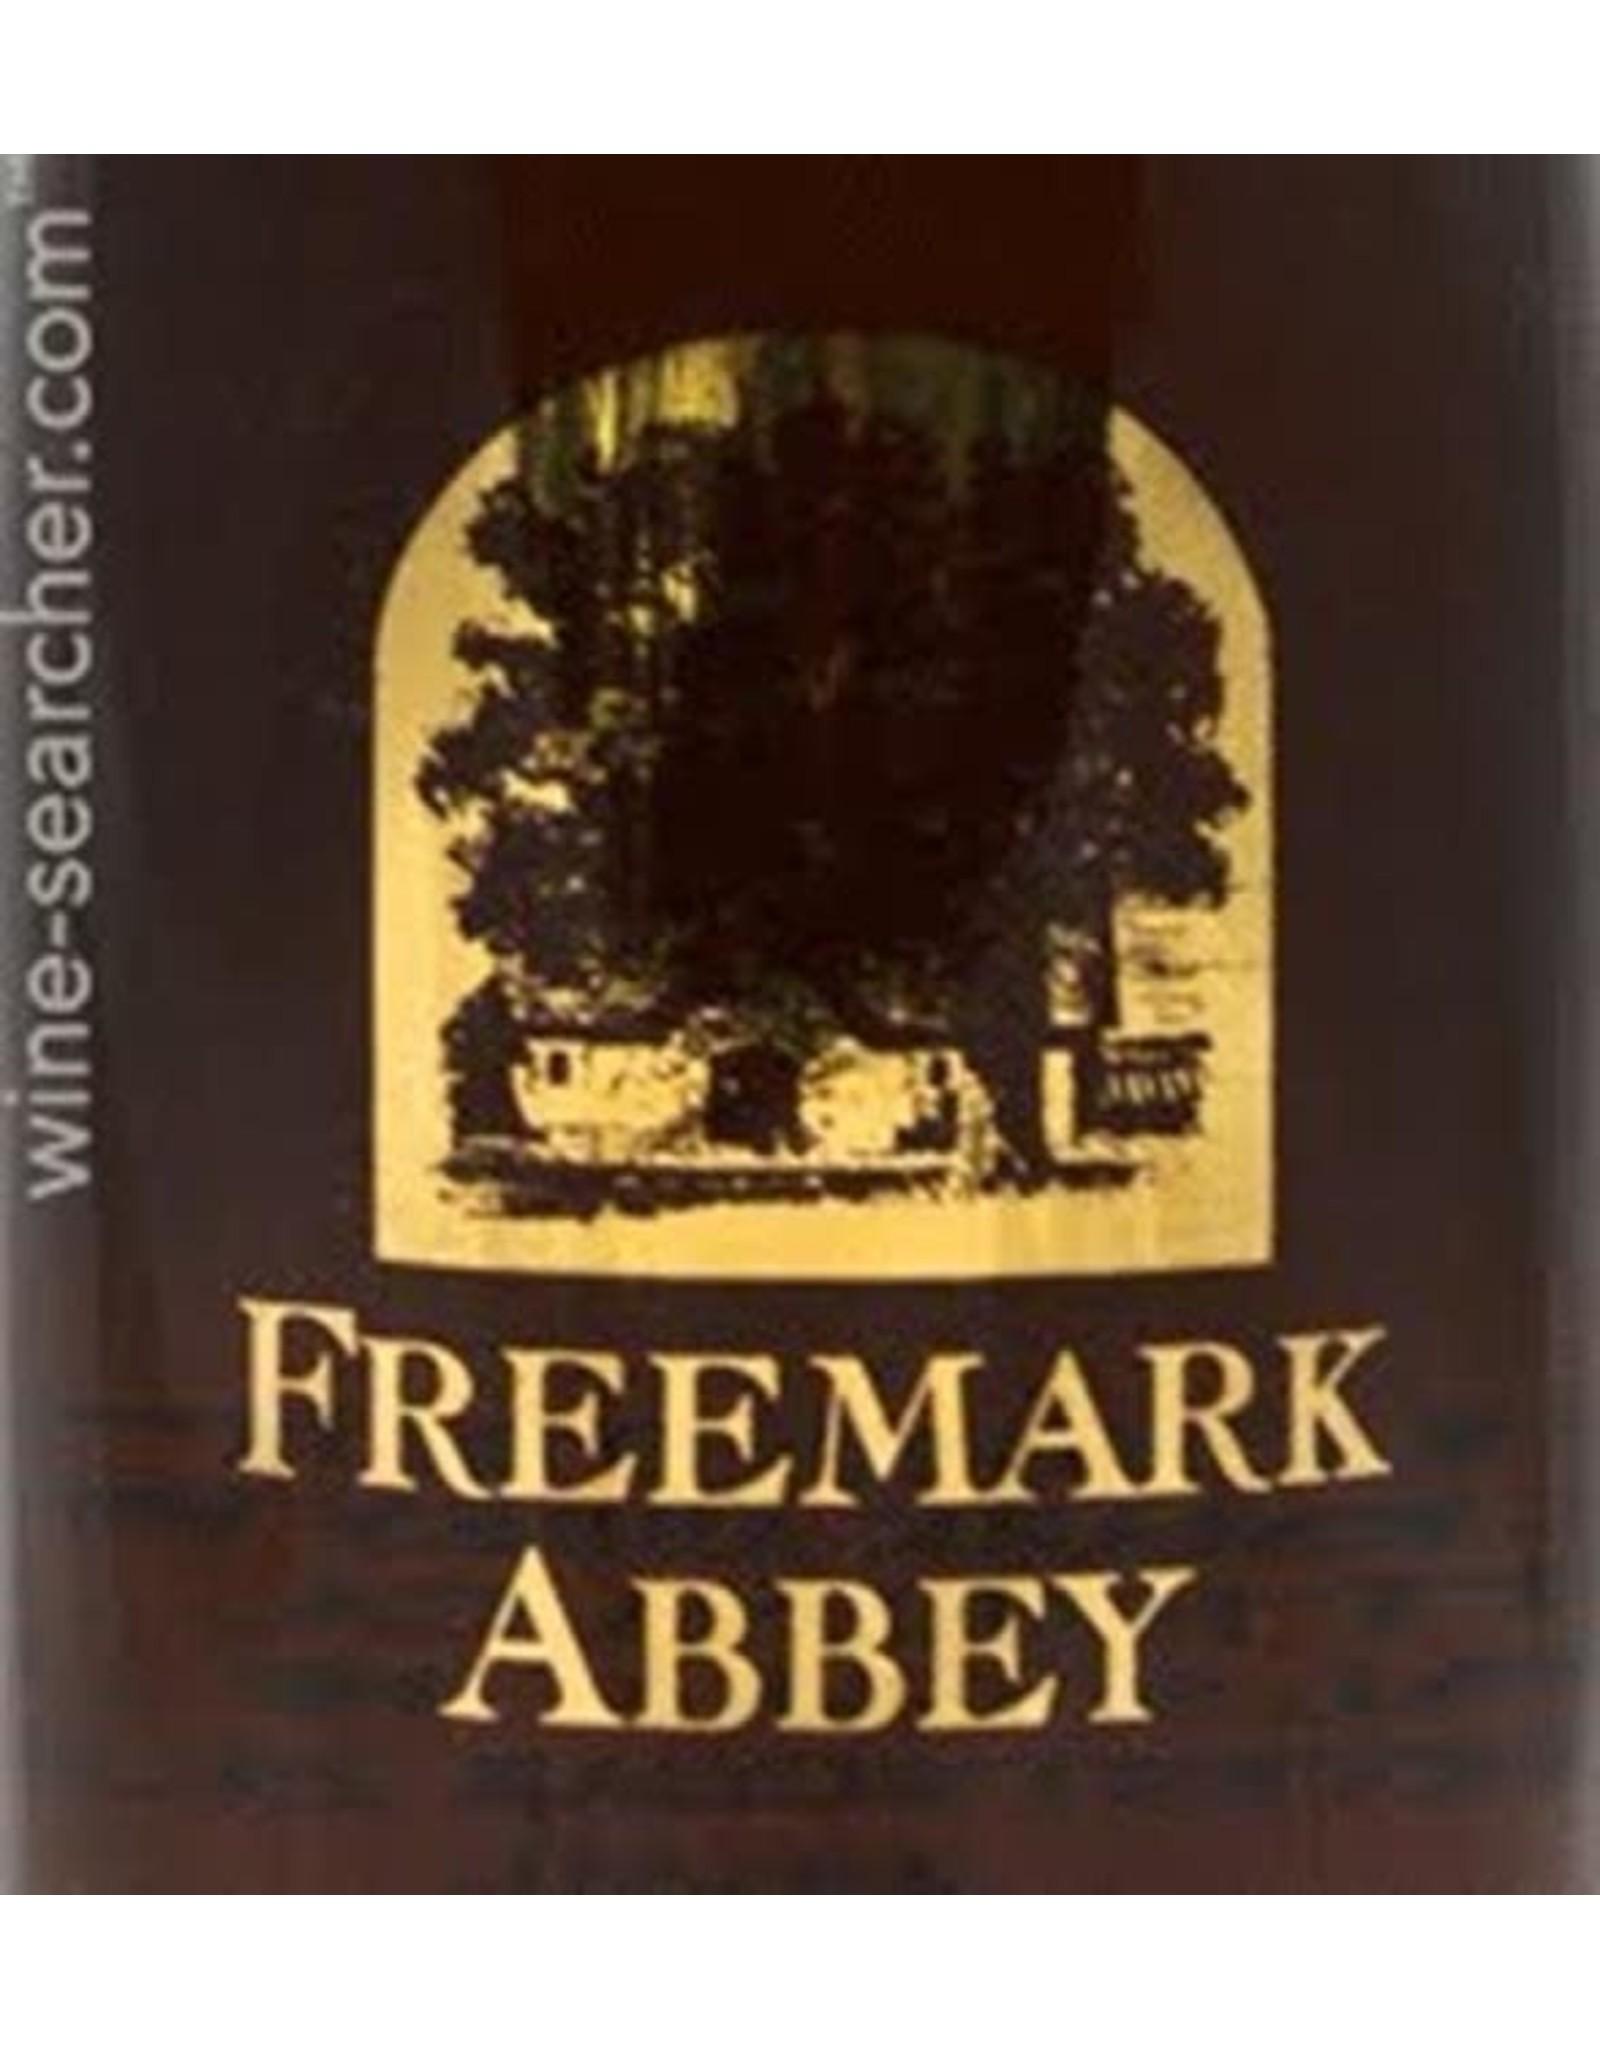 FREEMARK ABBEY 1999 REISLING 375ML